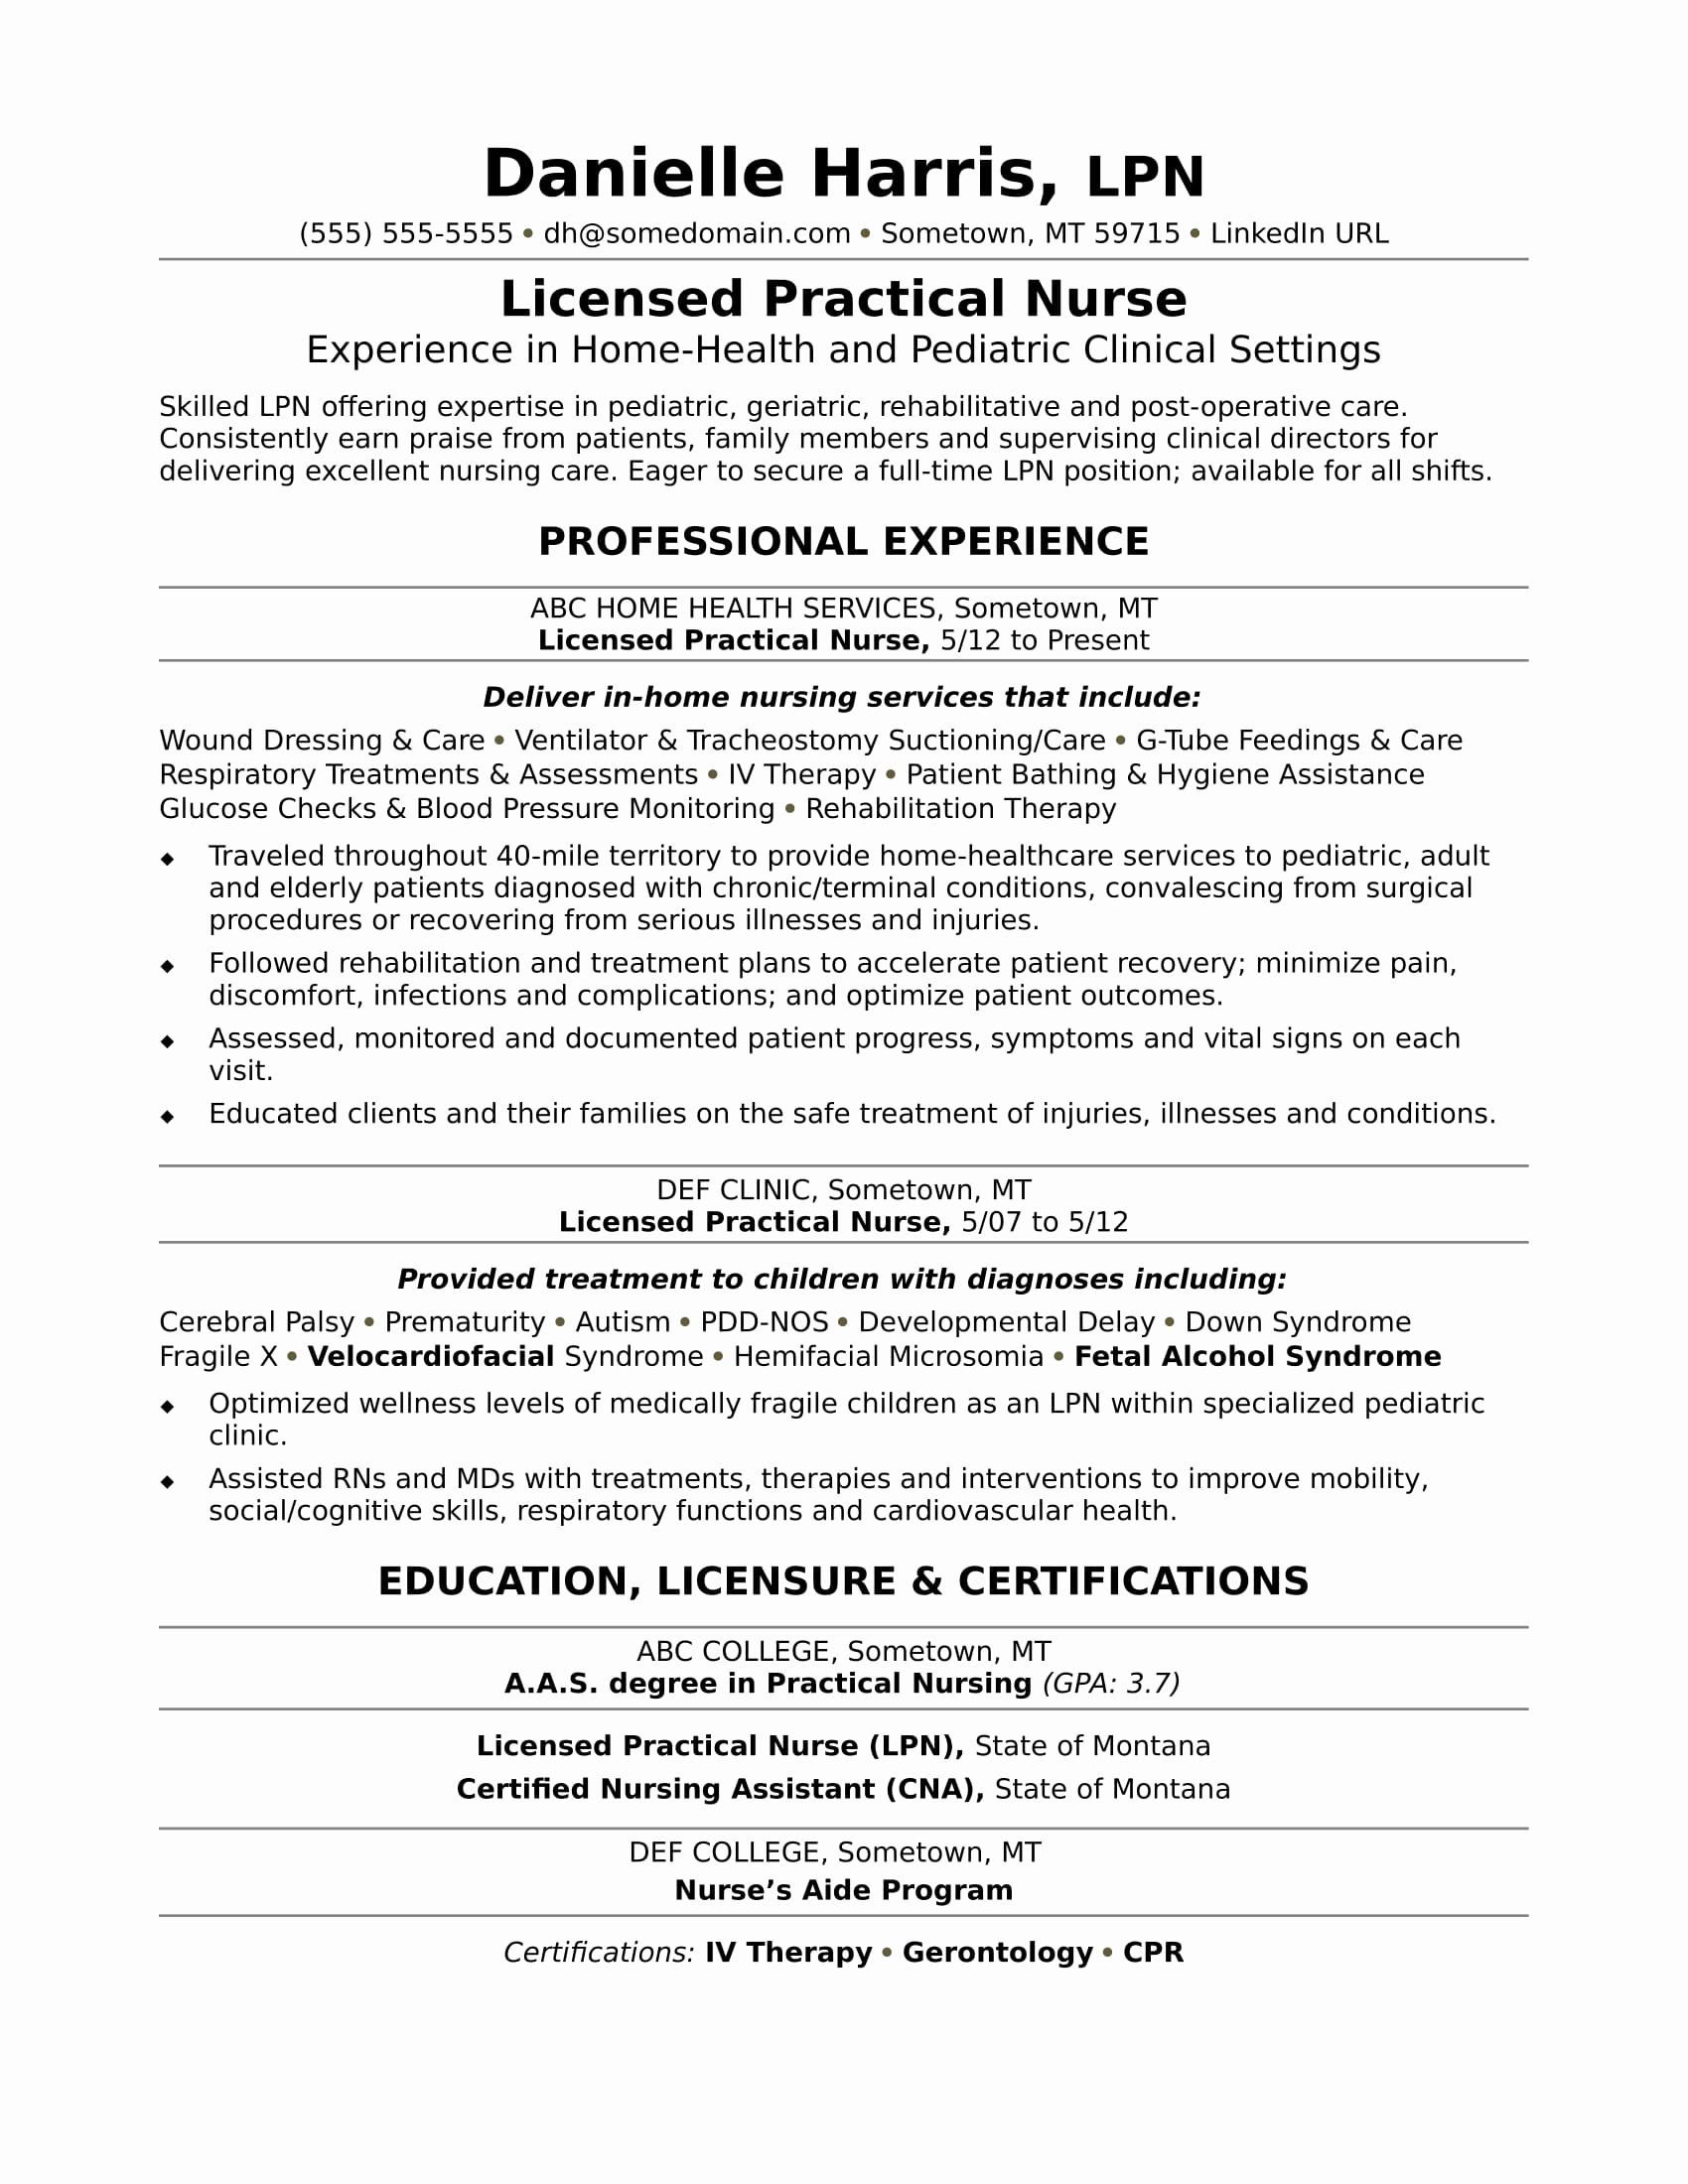 New Graduate Nurse Resume Examples Inspirational Licensed Practical Nurse Resume Sample